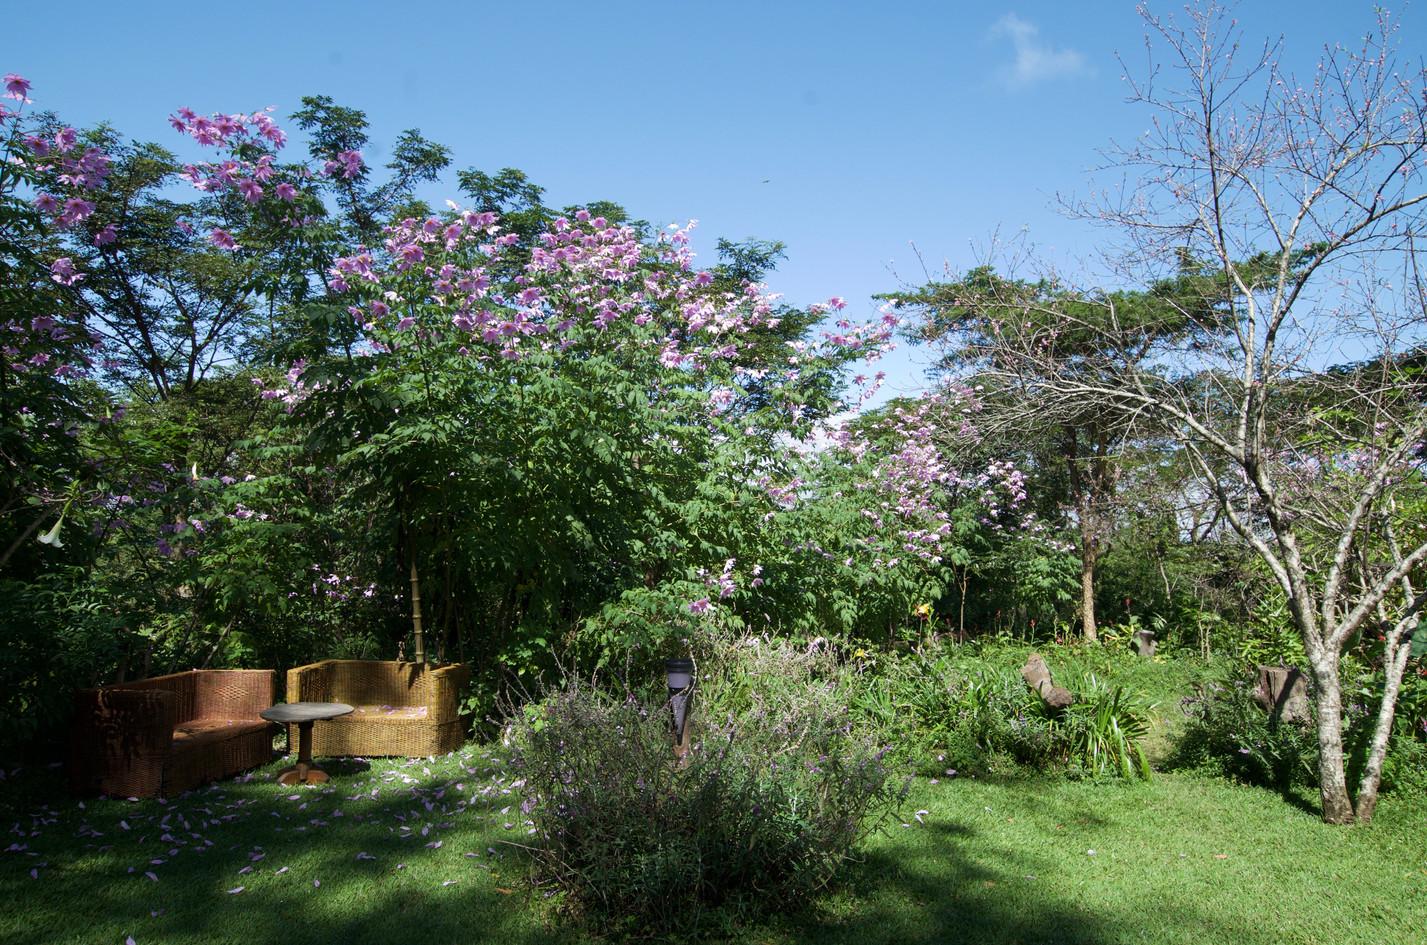 ZFL garden in flower.jpg